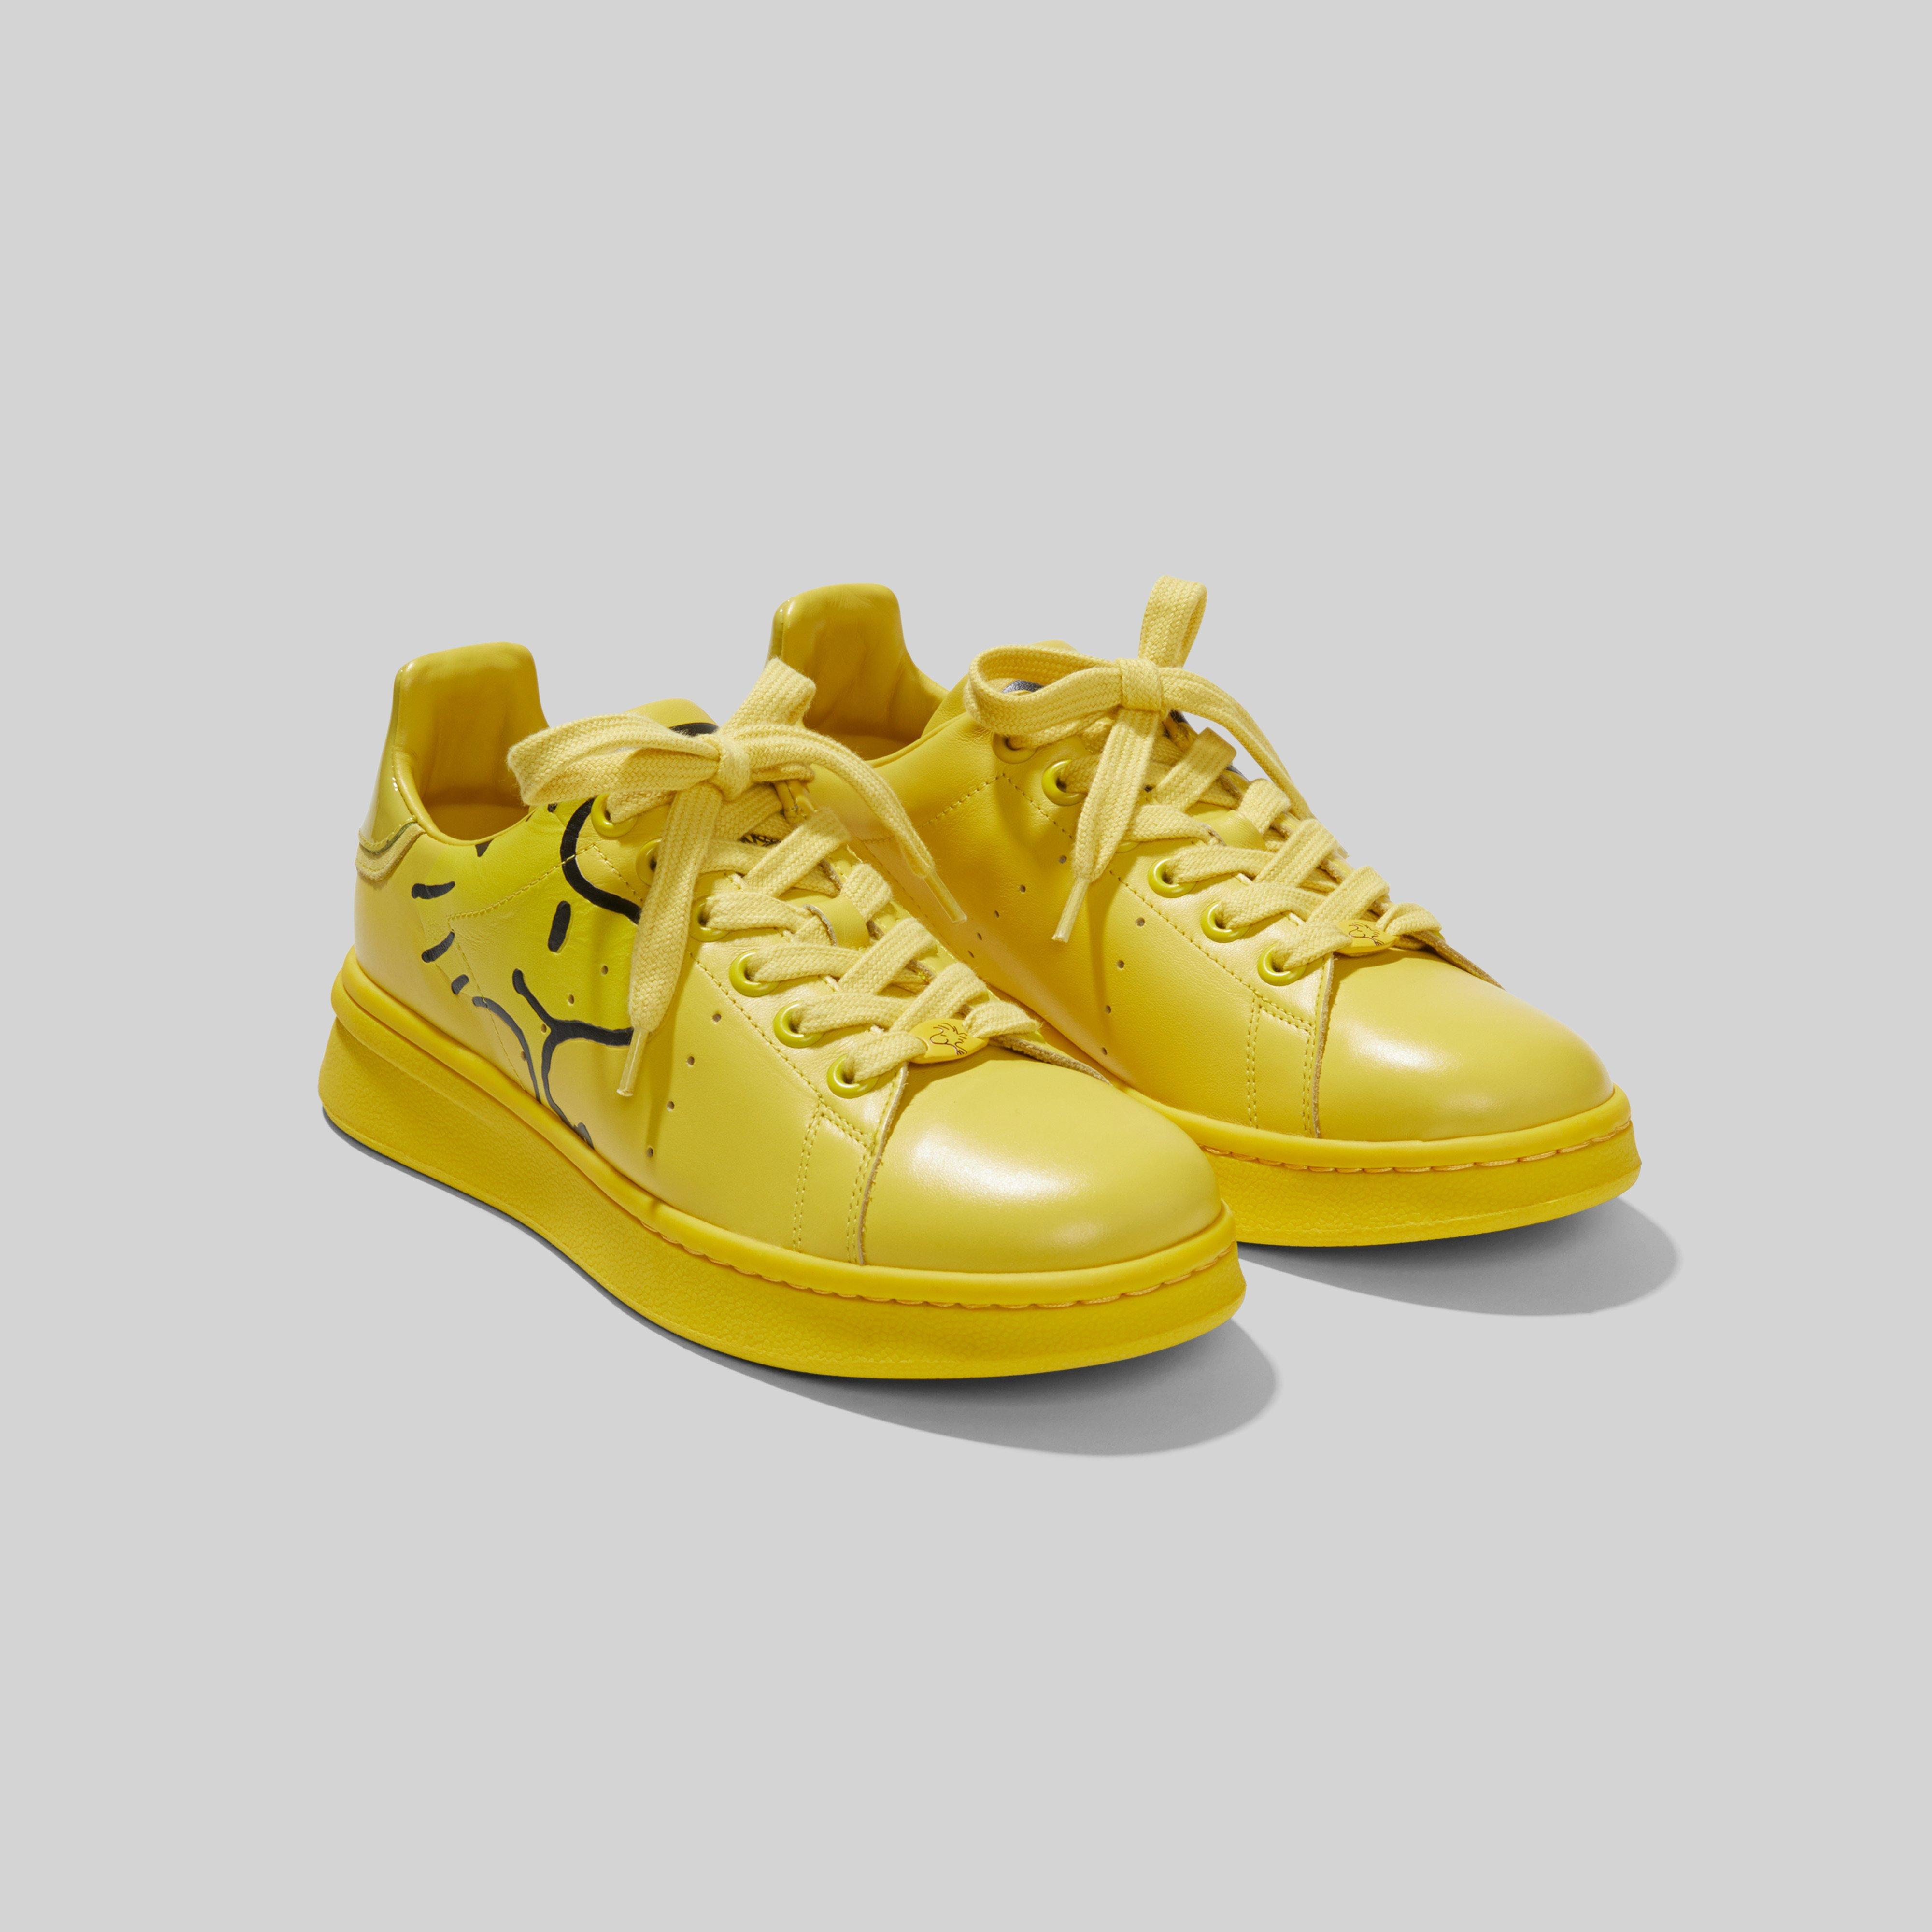 Marc Jacobs Peanuts x Marc Jacobs The Tennis Shoe